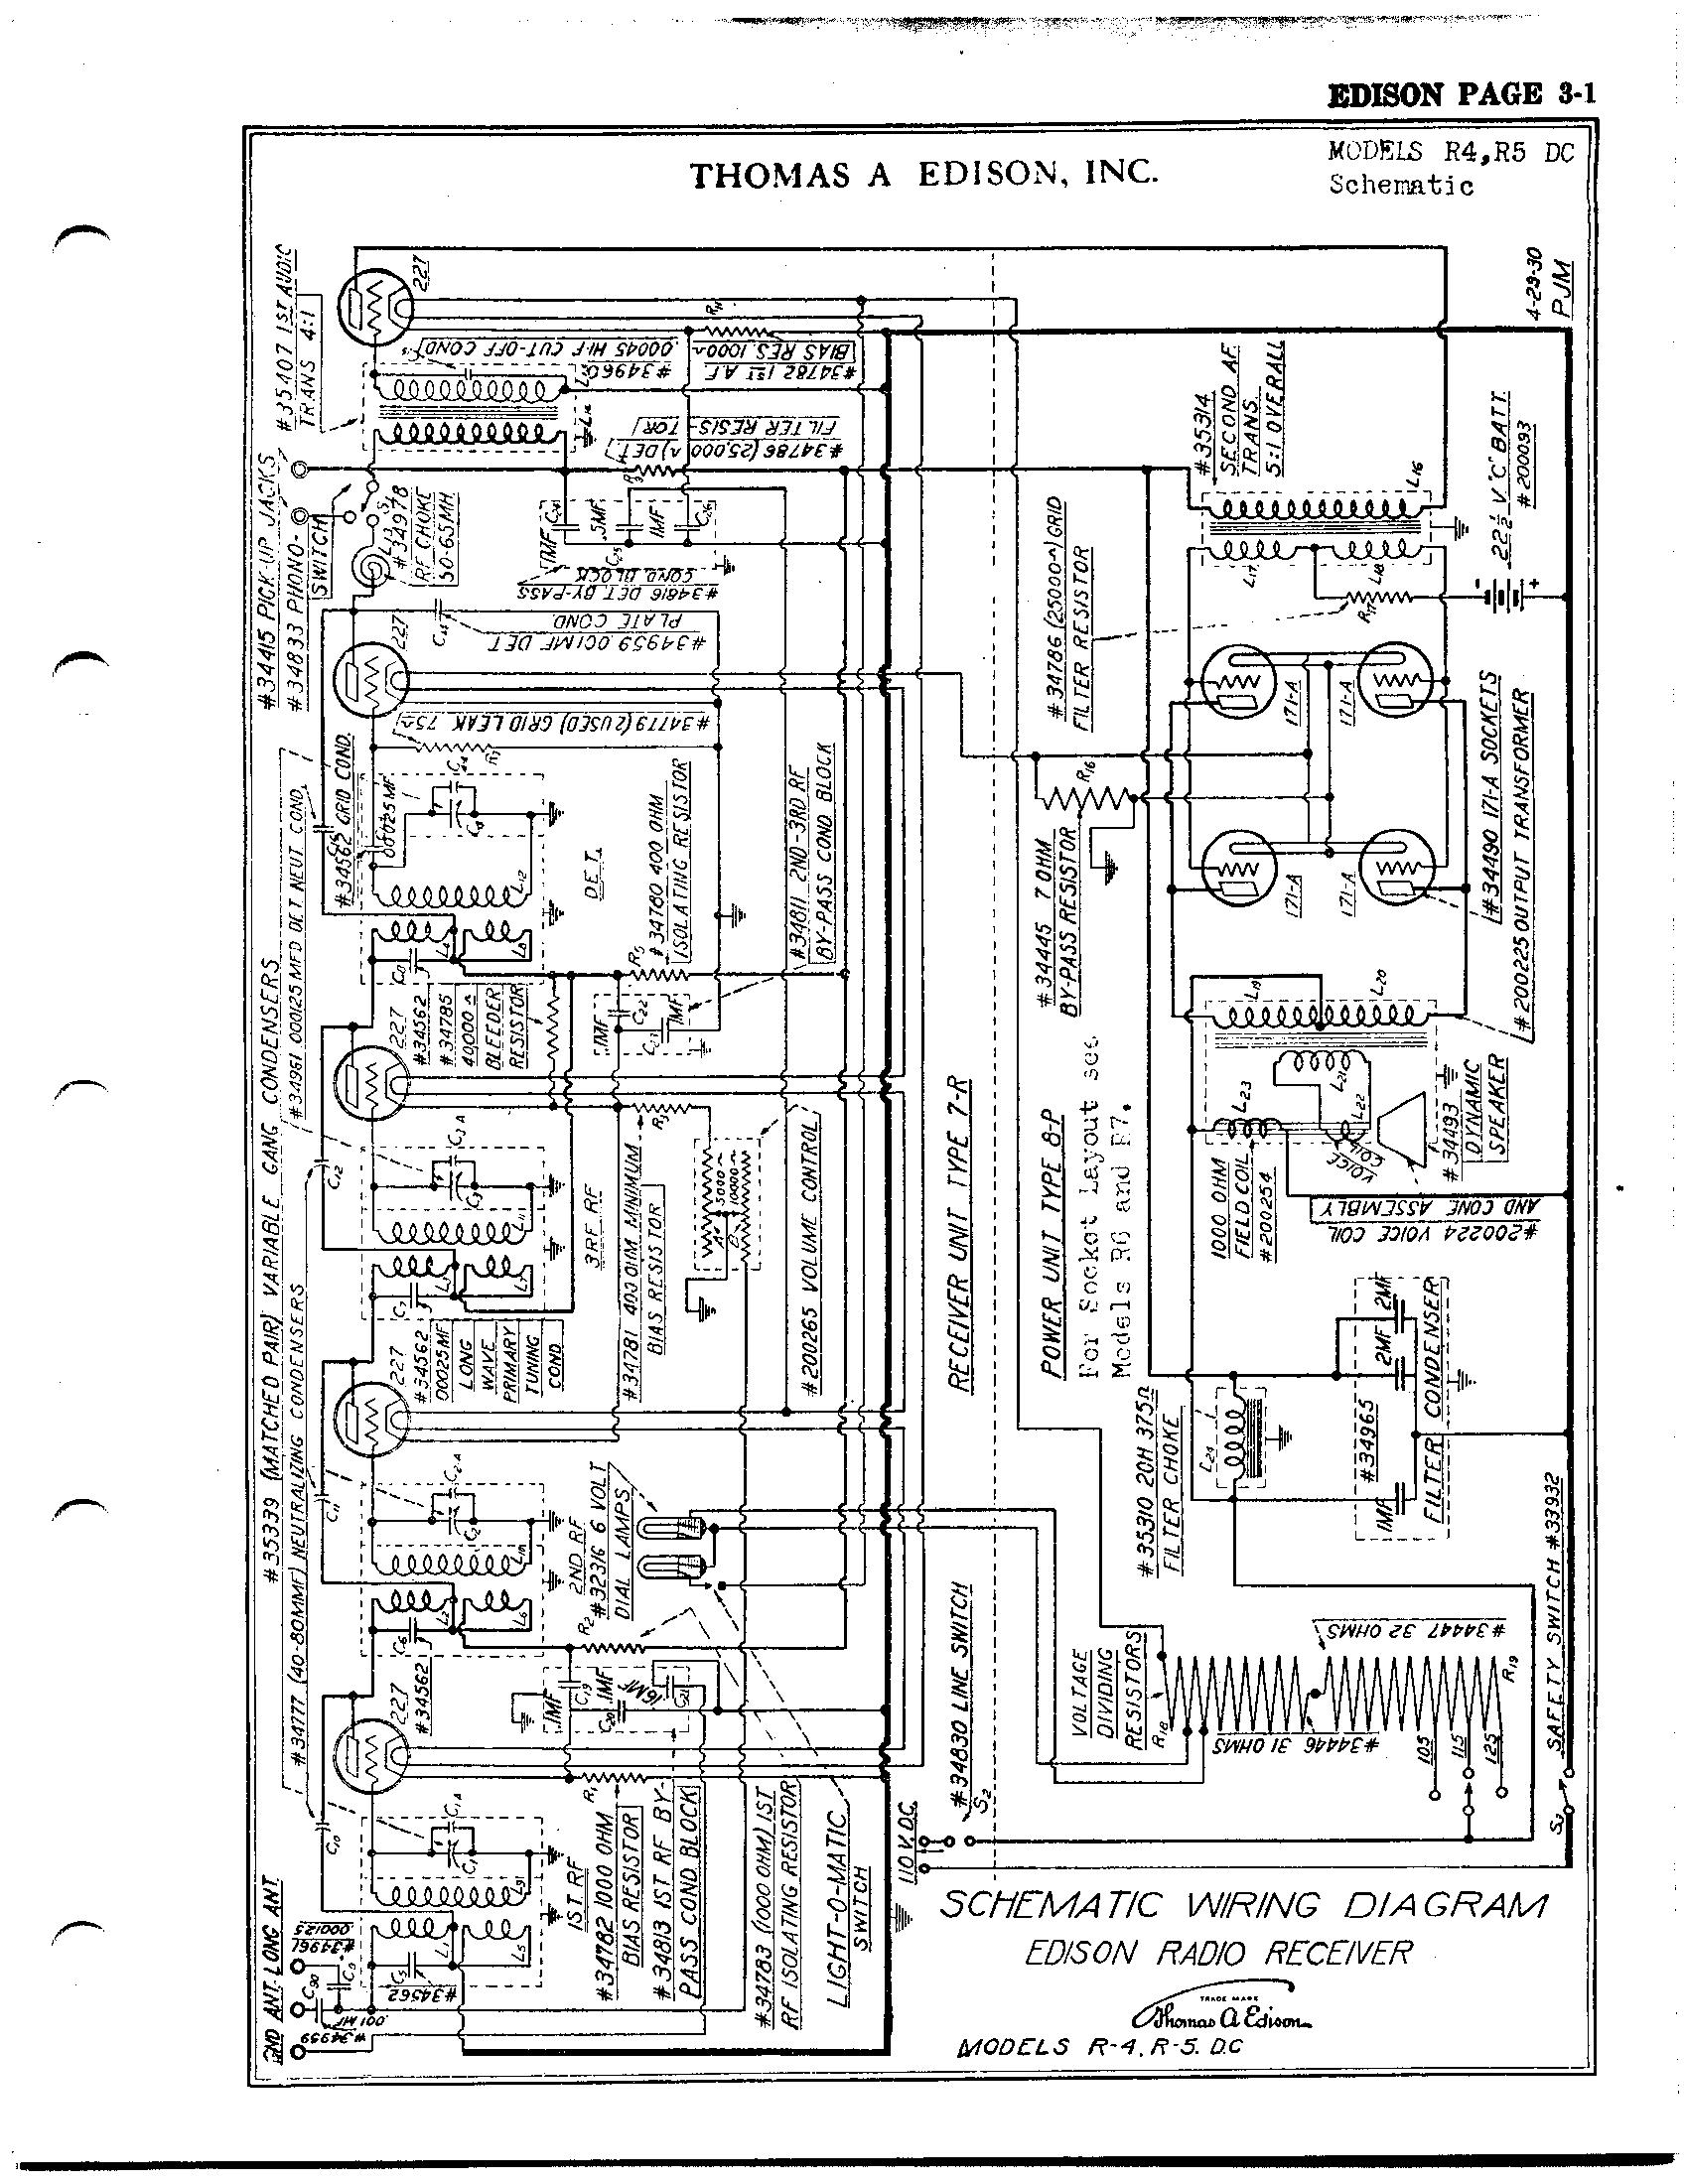 Thomas A. Edison, Inc. R5 | Antique Electronic Supply